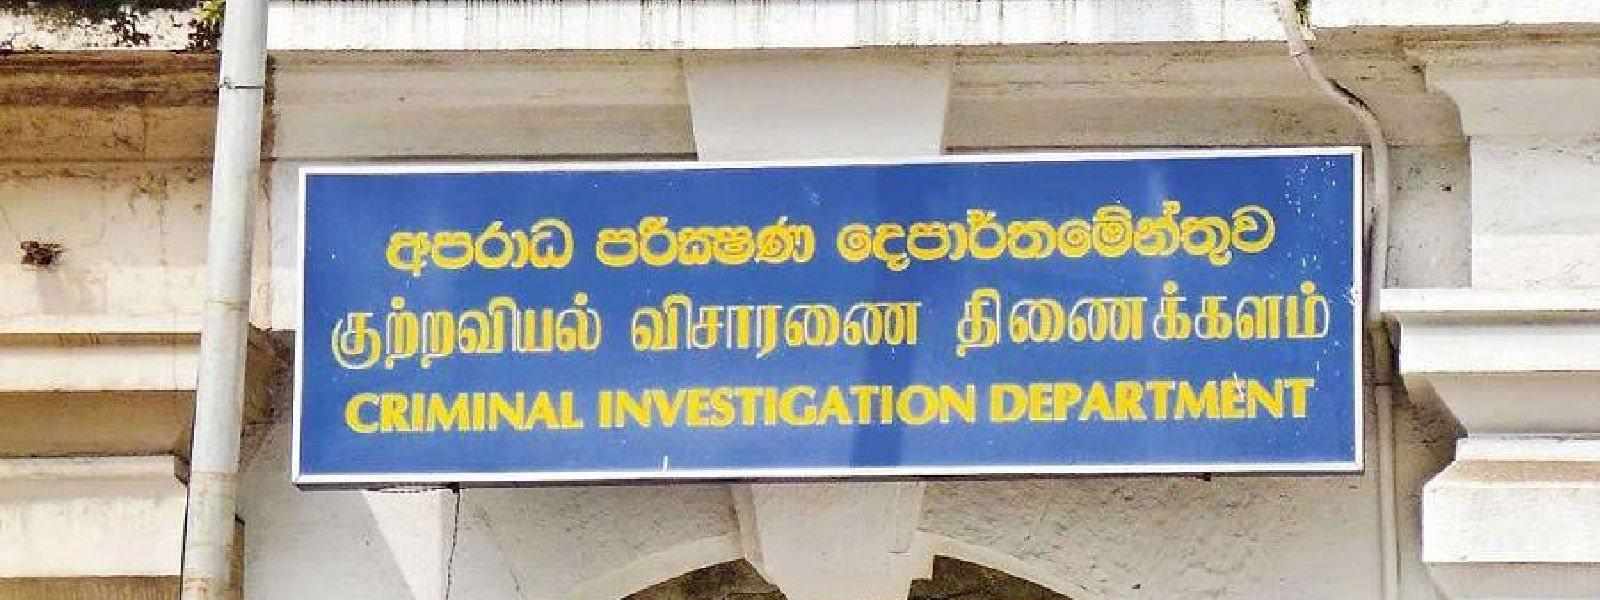 Teachers summoned to CID over alleged threats to other teachers